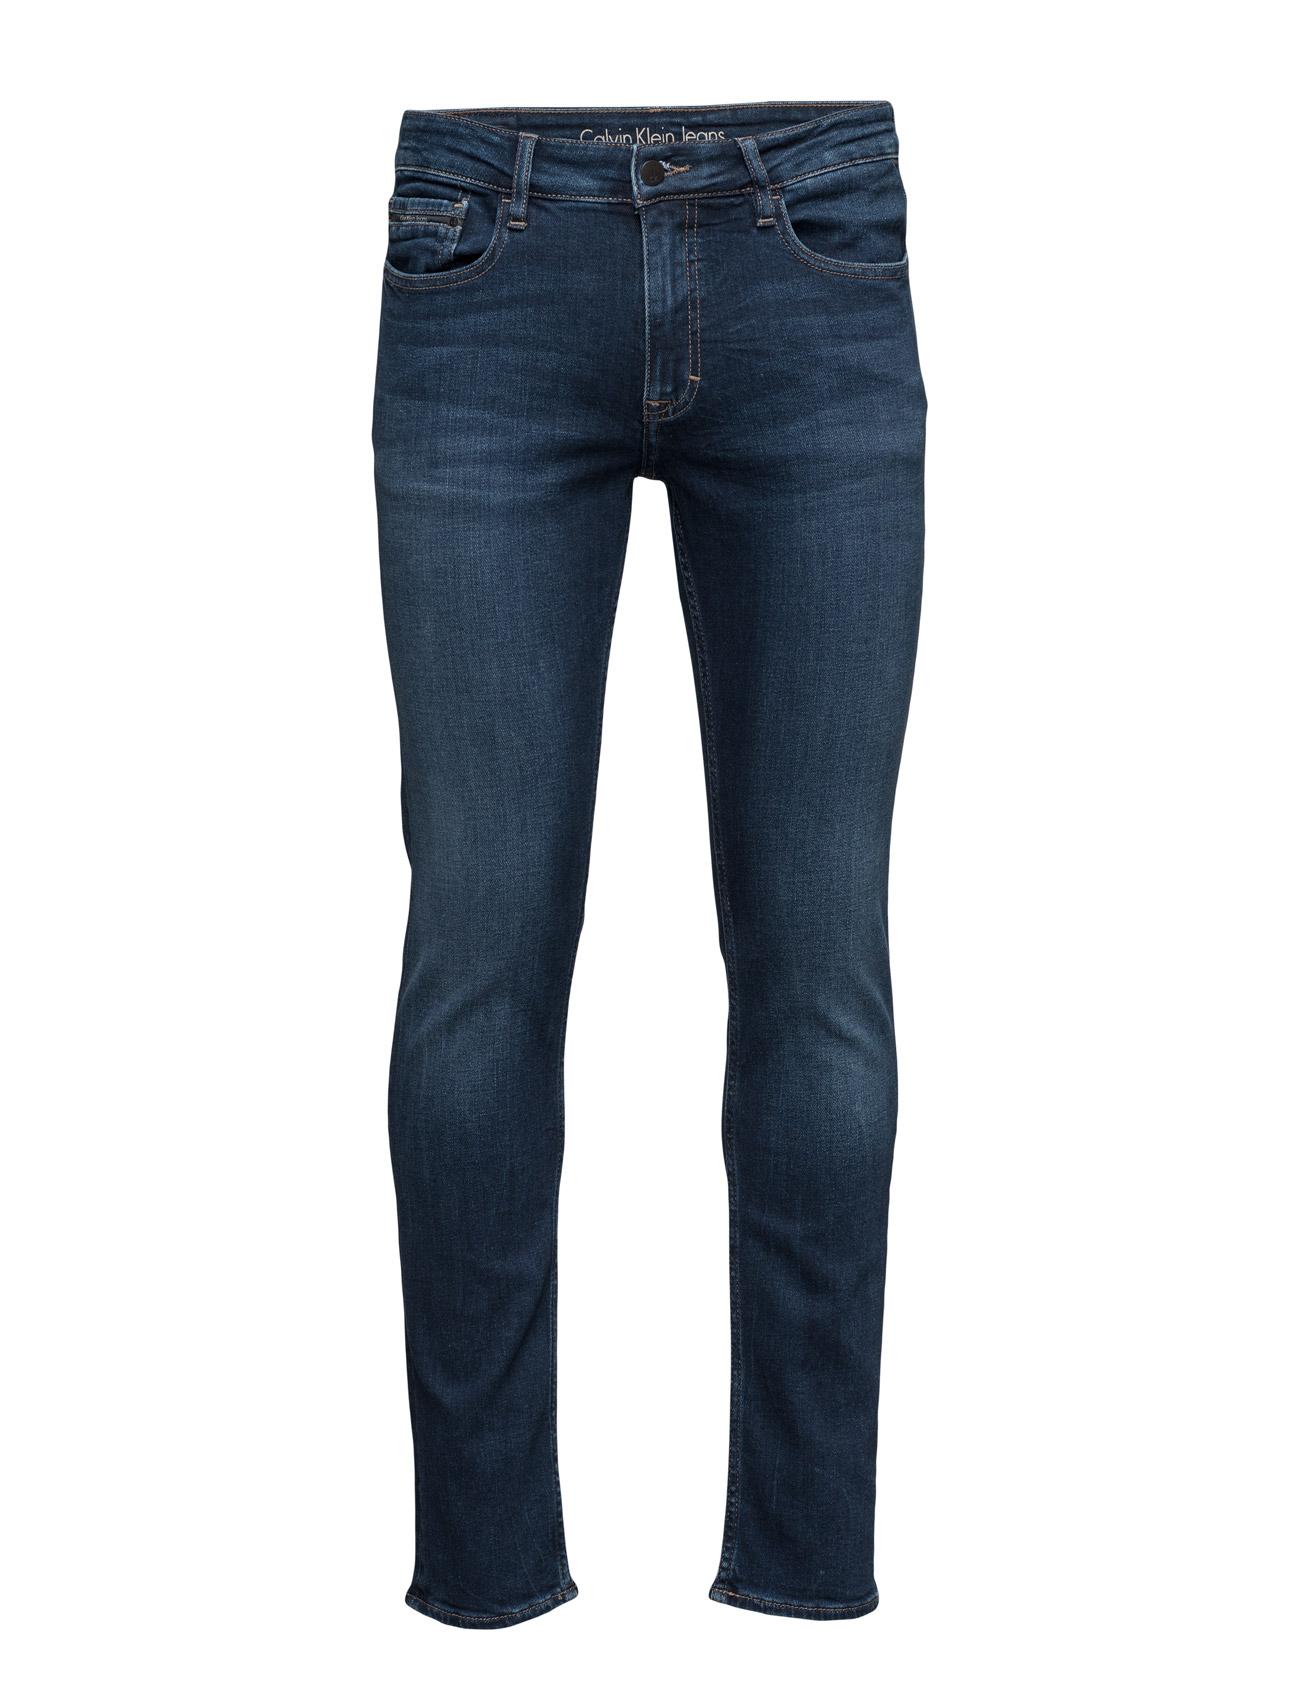 calvin klein jeans Slim straight - true fra boozt.com dk